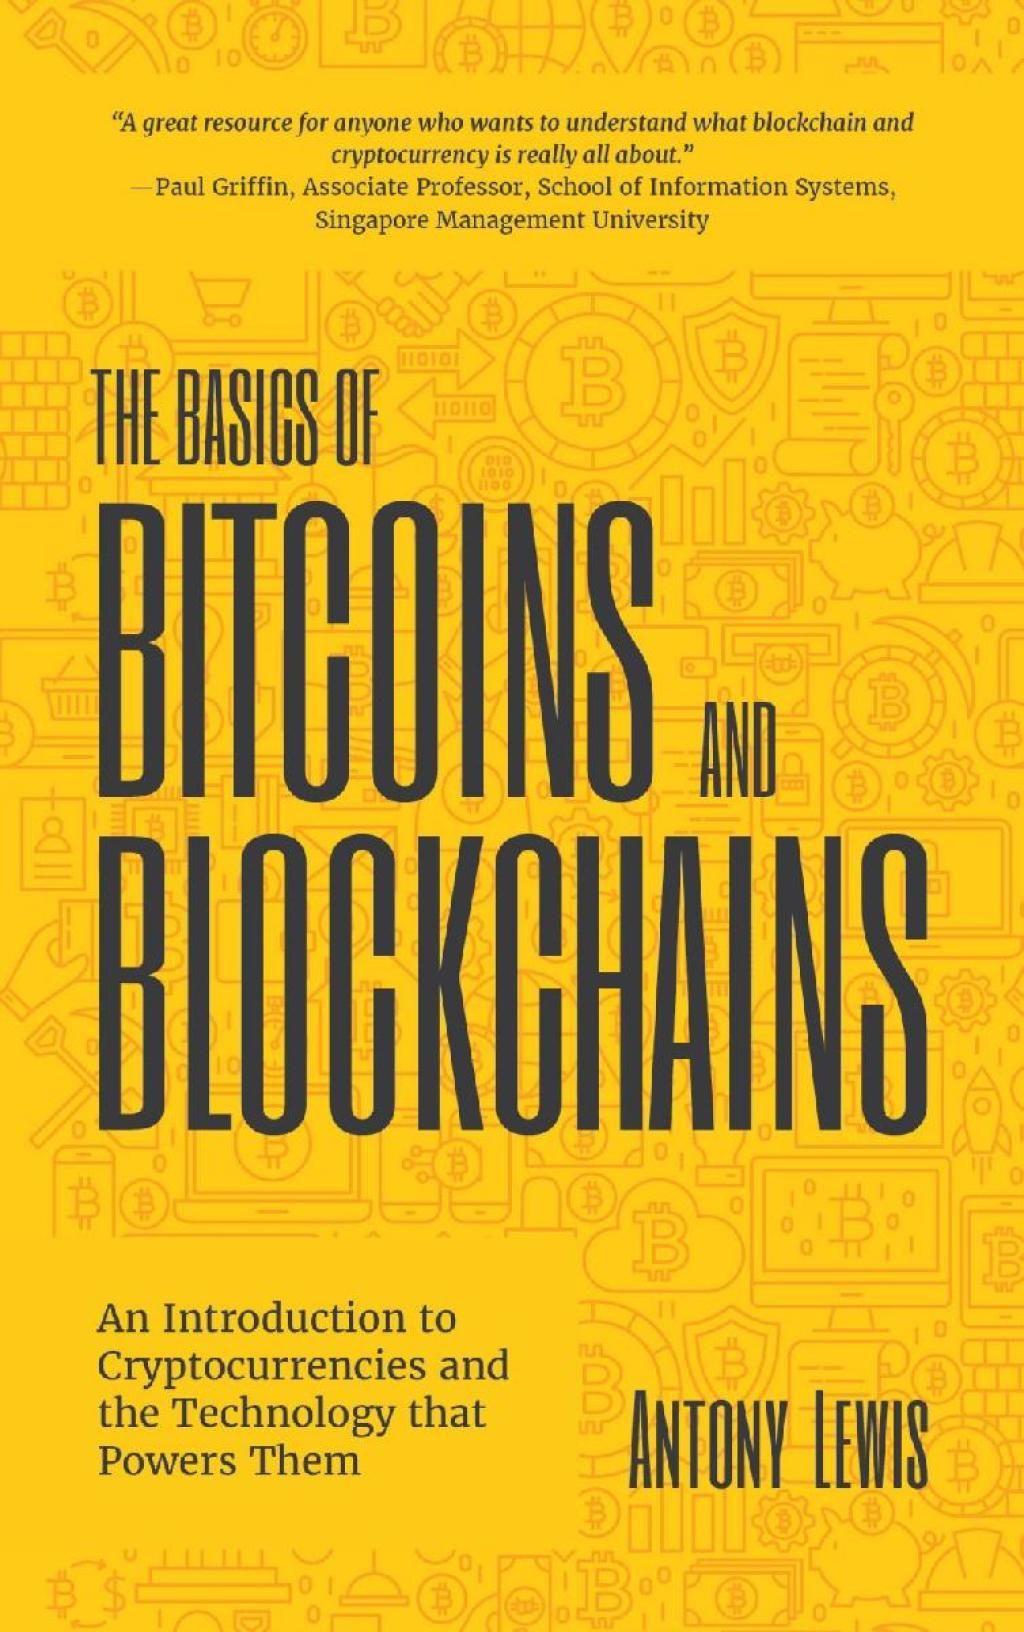 Blockchain revolution pdf free download torrent